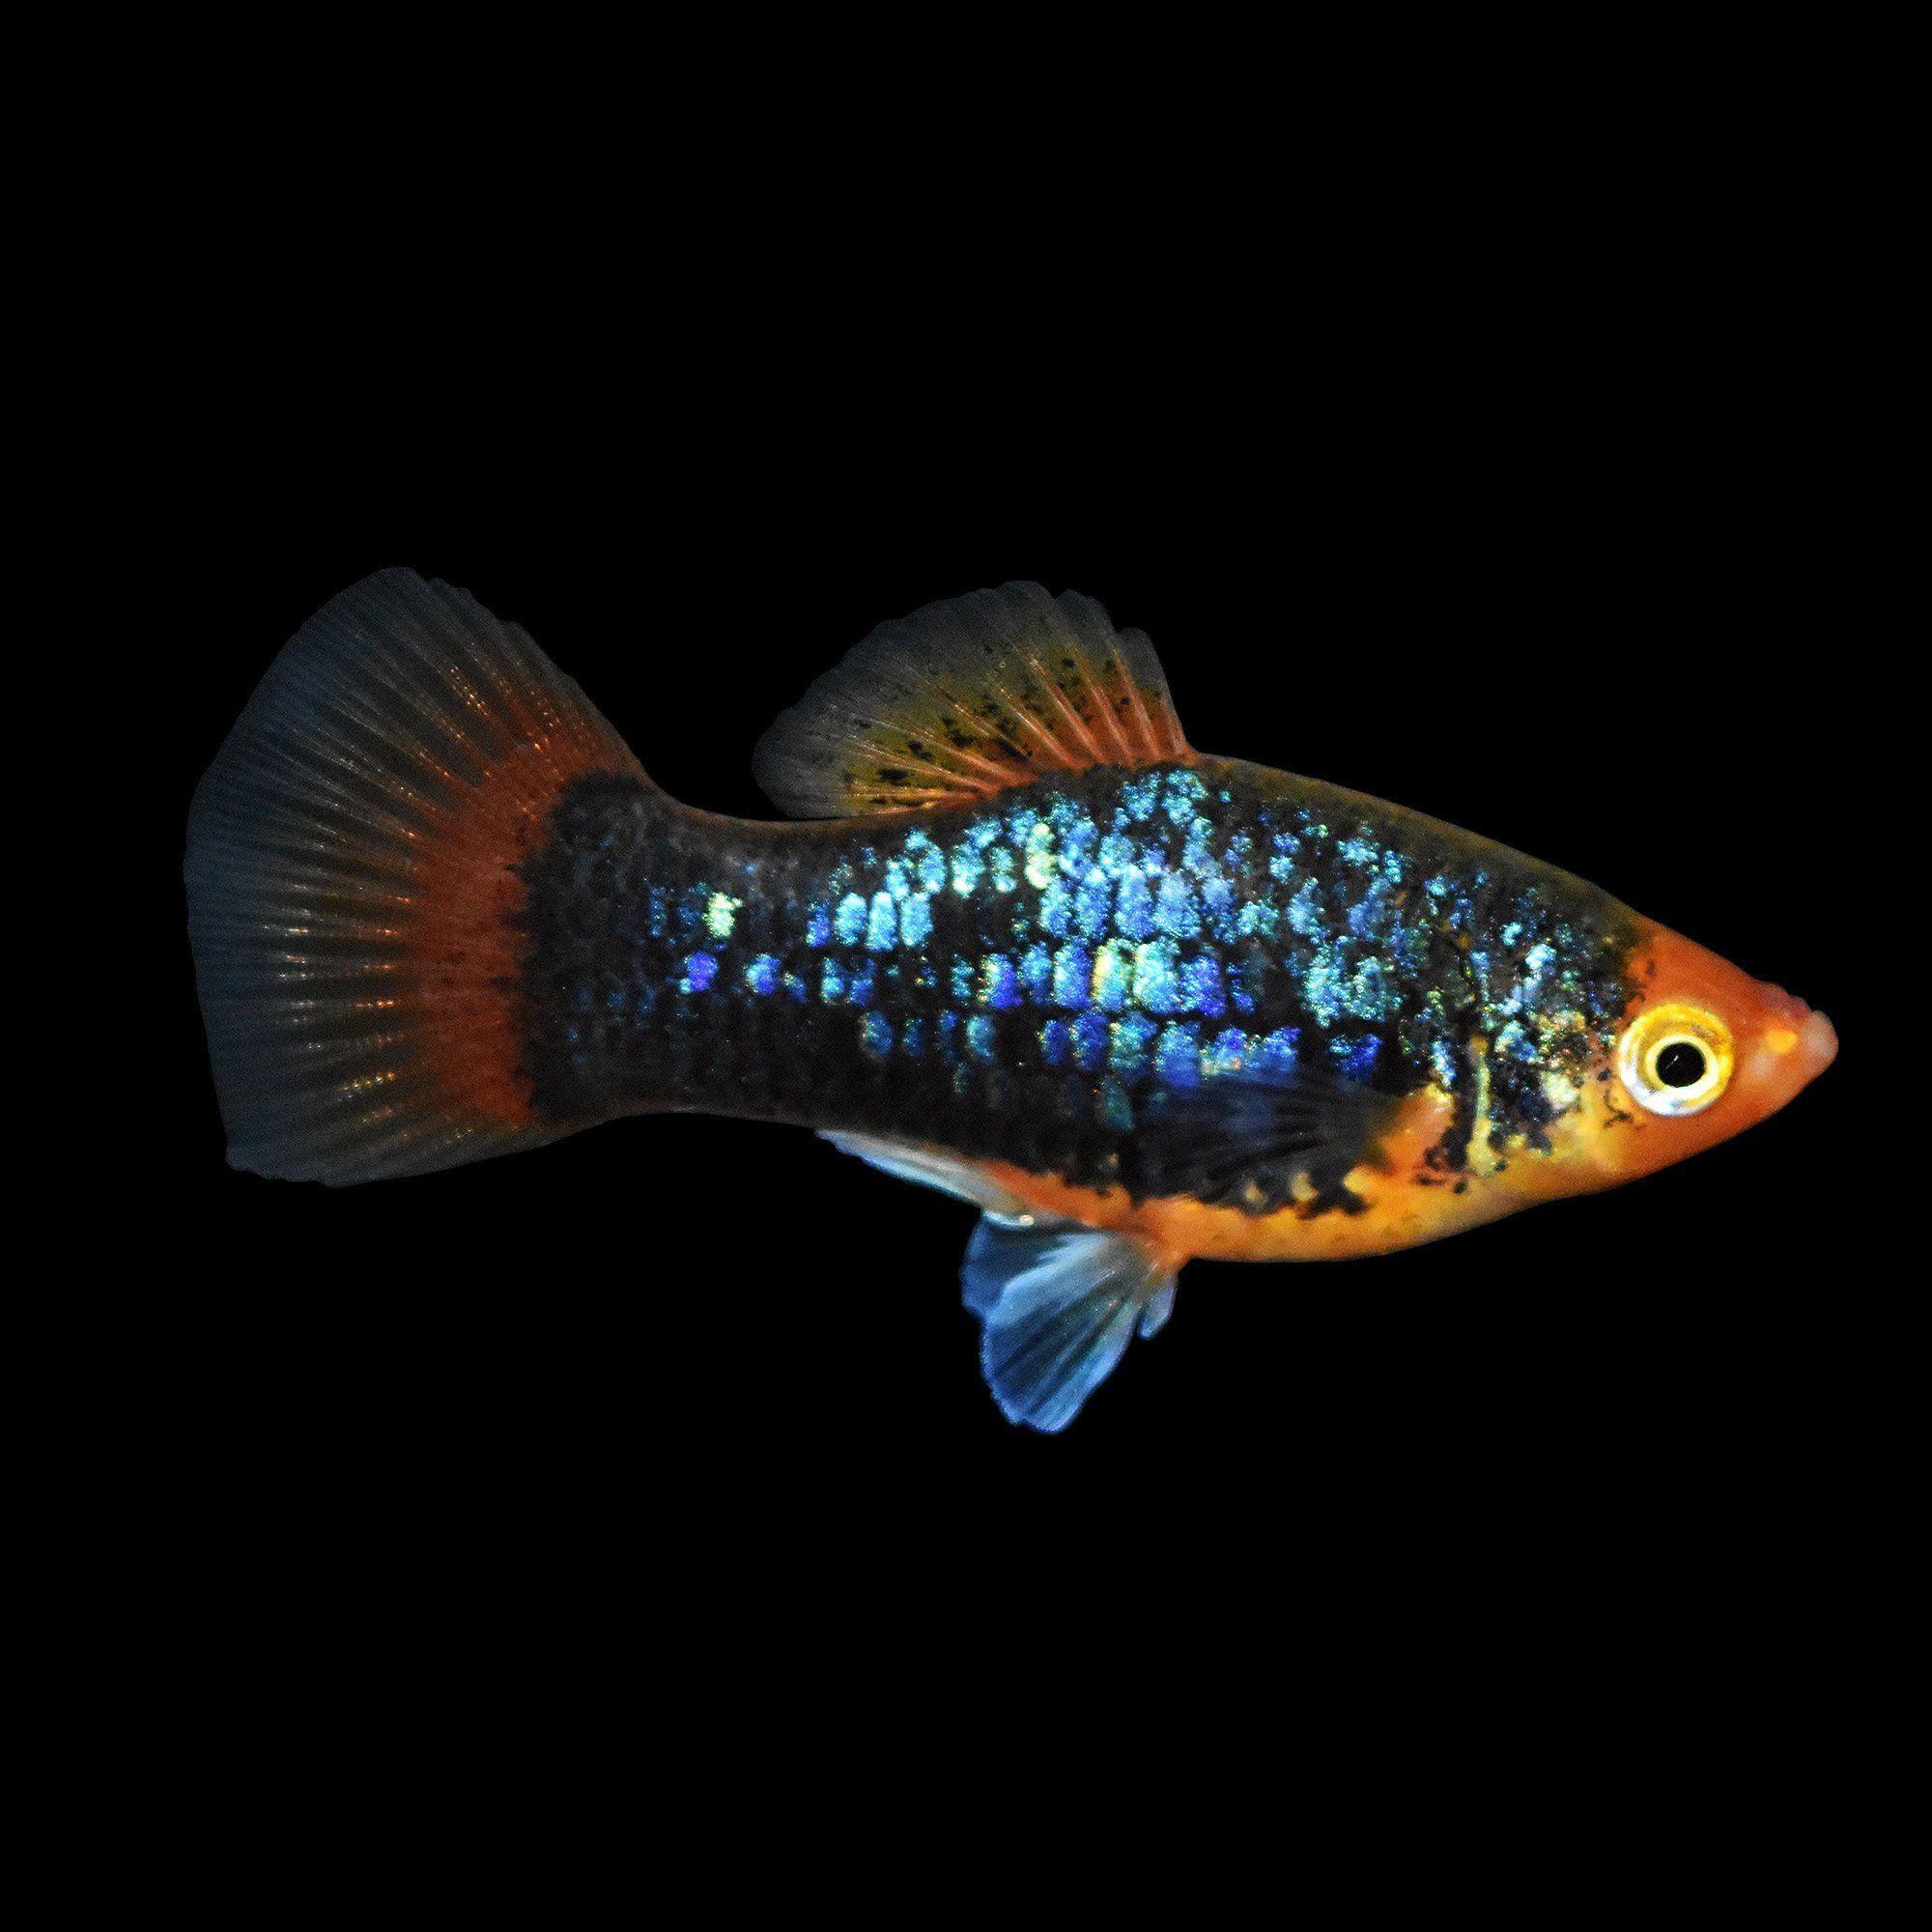 Assorted Platies Petco Aquariumfreshwaterfishguys In 2020 Tropical Freshwater Fish Live Freshwater Fish Freshwater Aquarium Fish